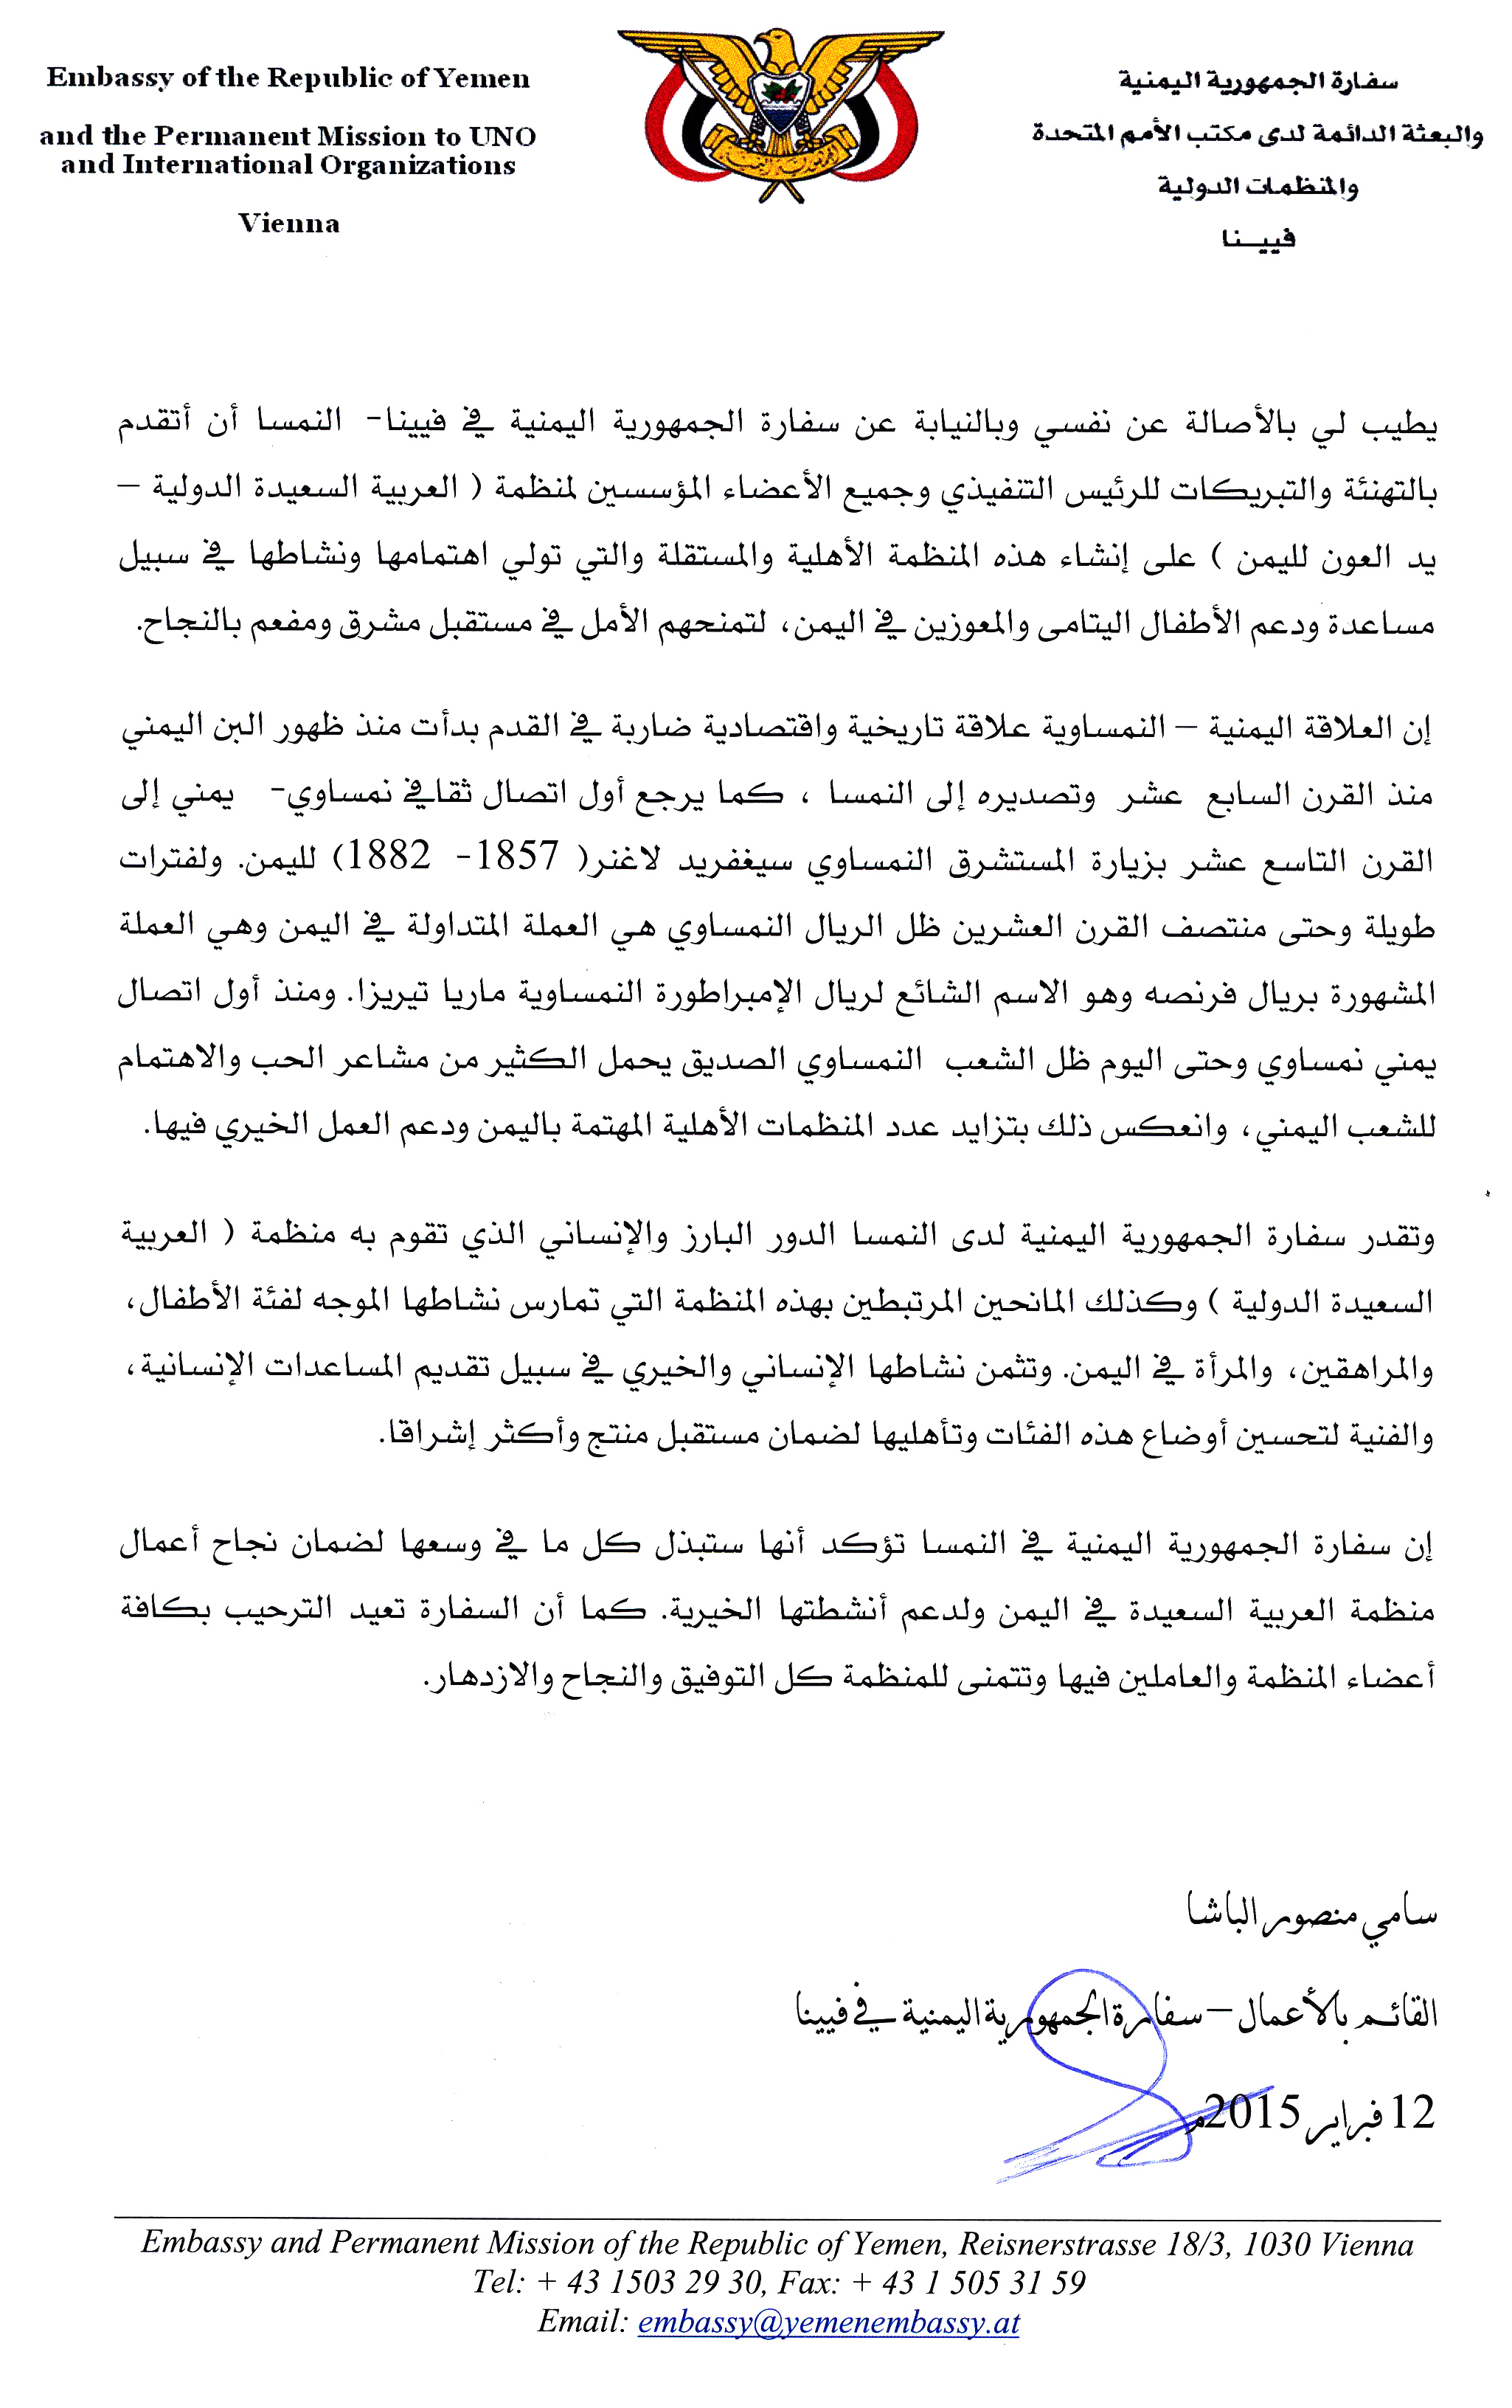 arab_welcoming_adress